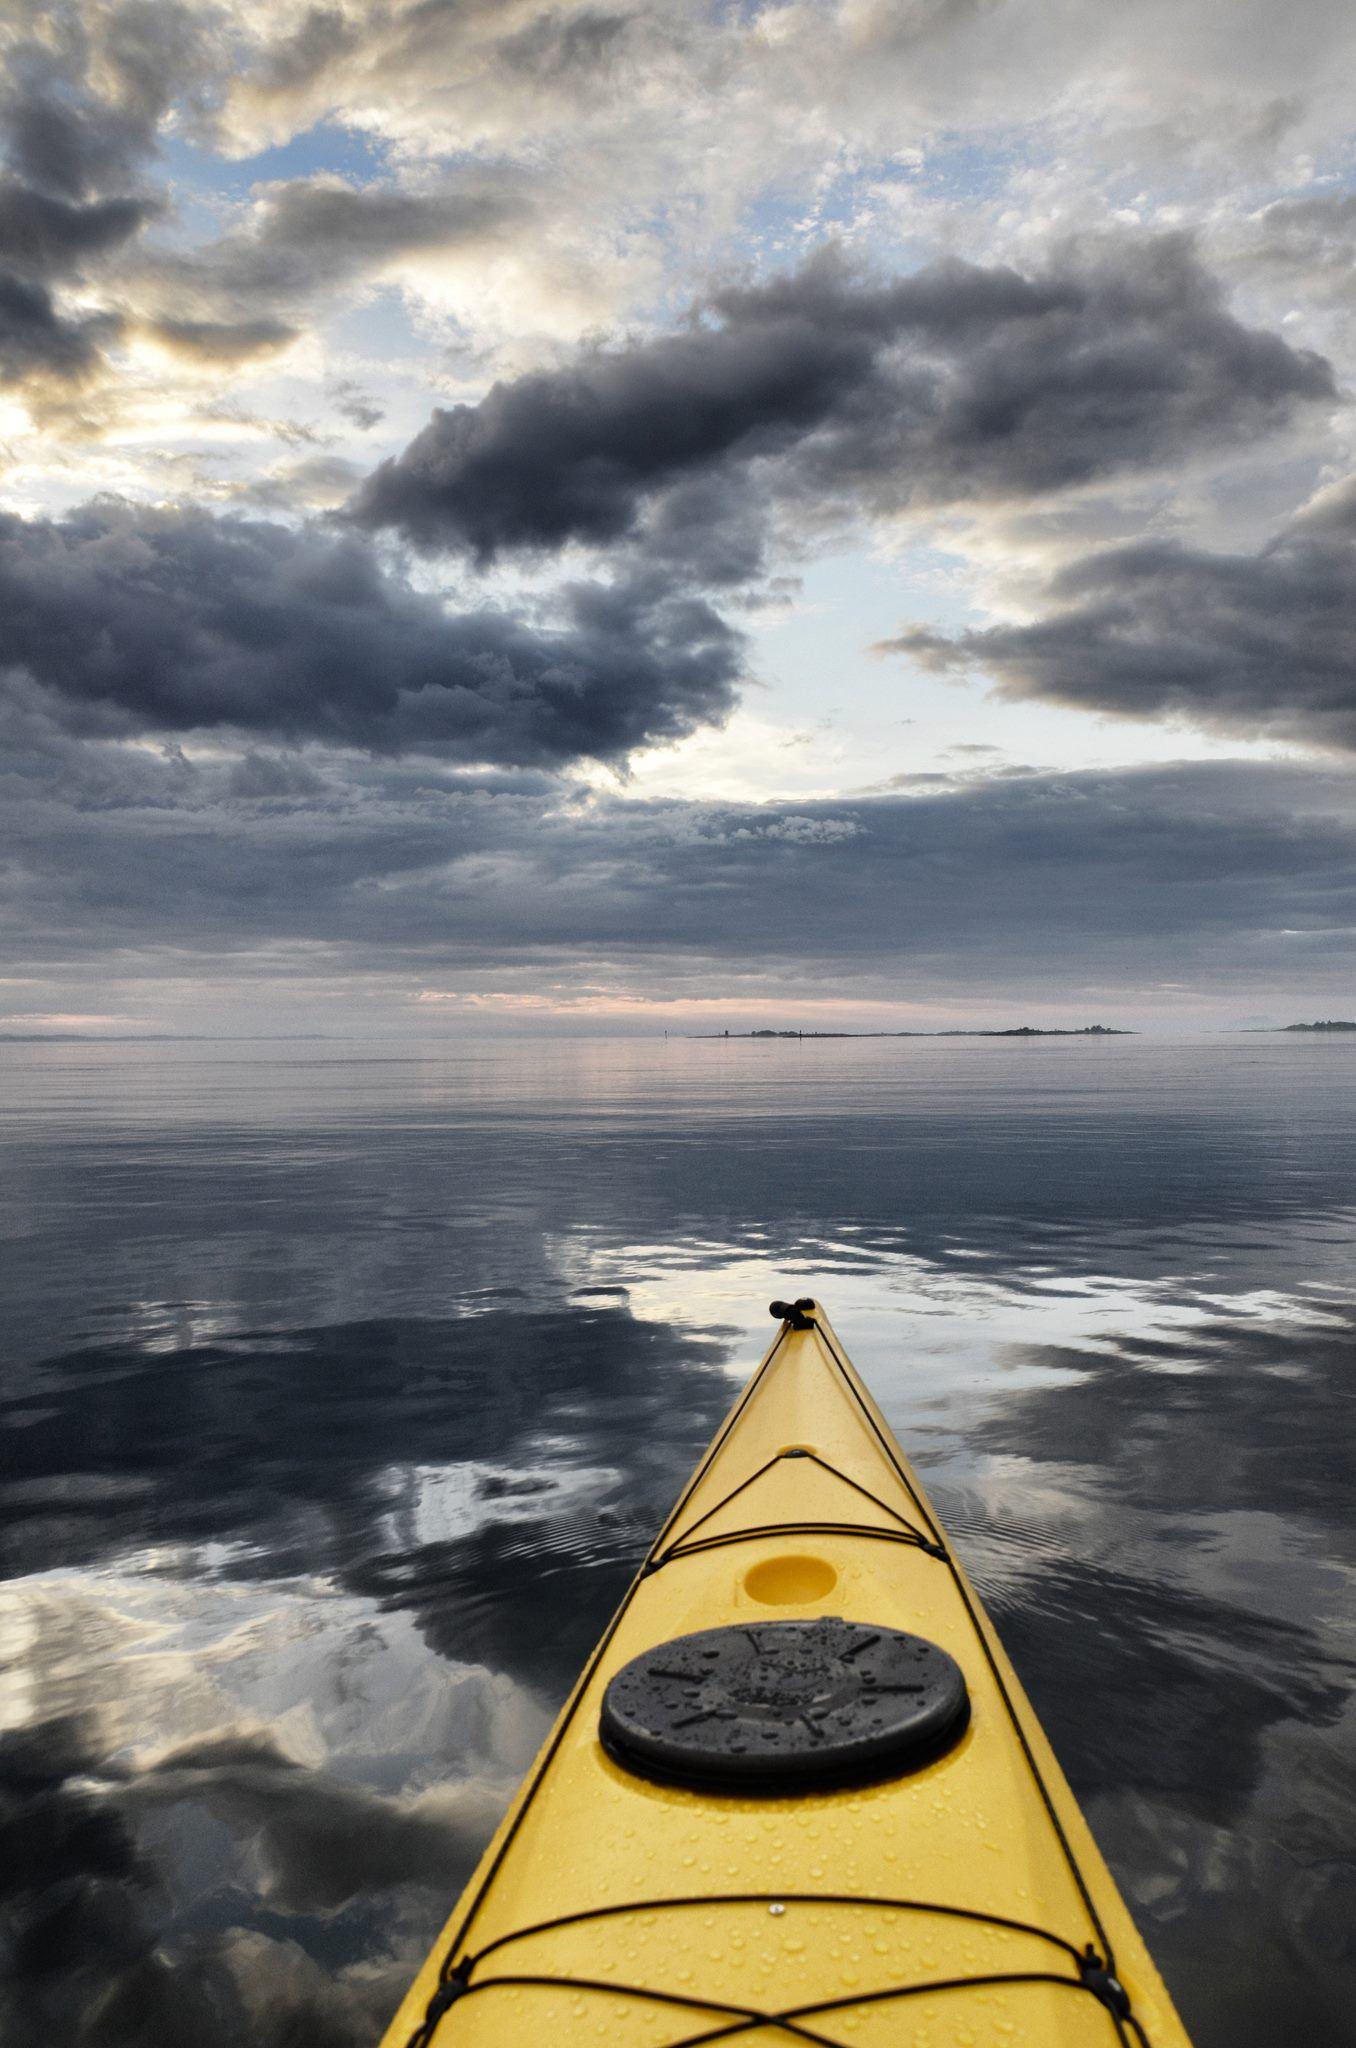 Nordnorsk Opplevelse (Northern Norway Adventures)